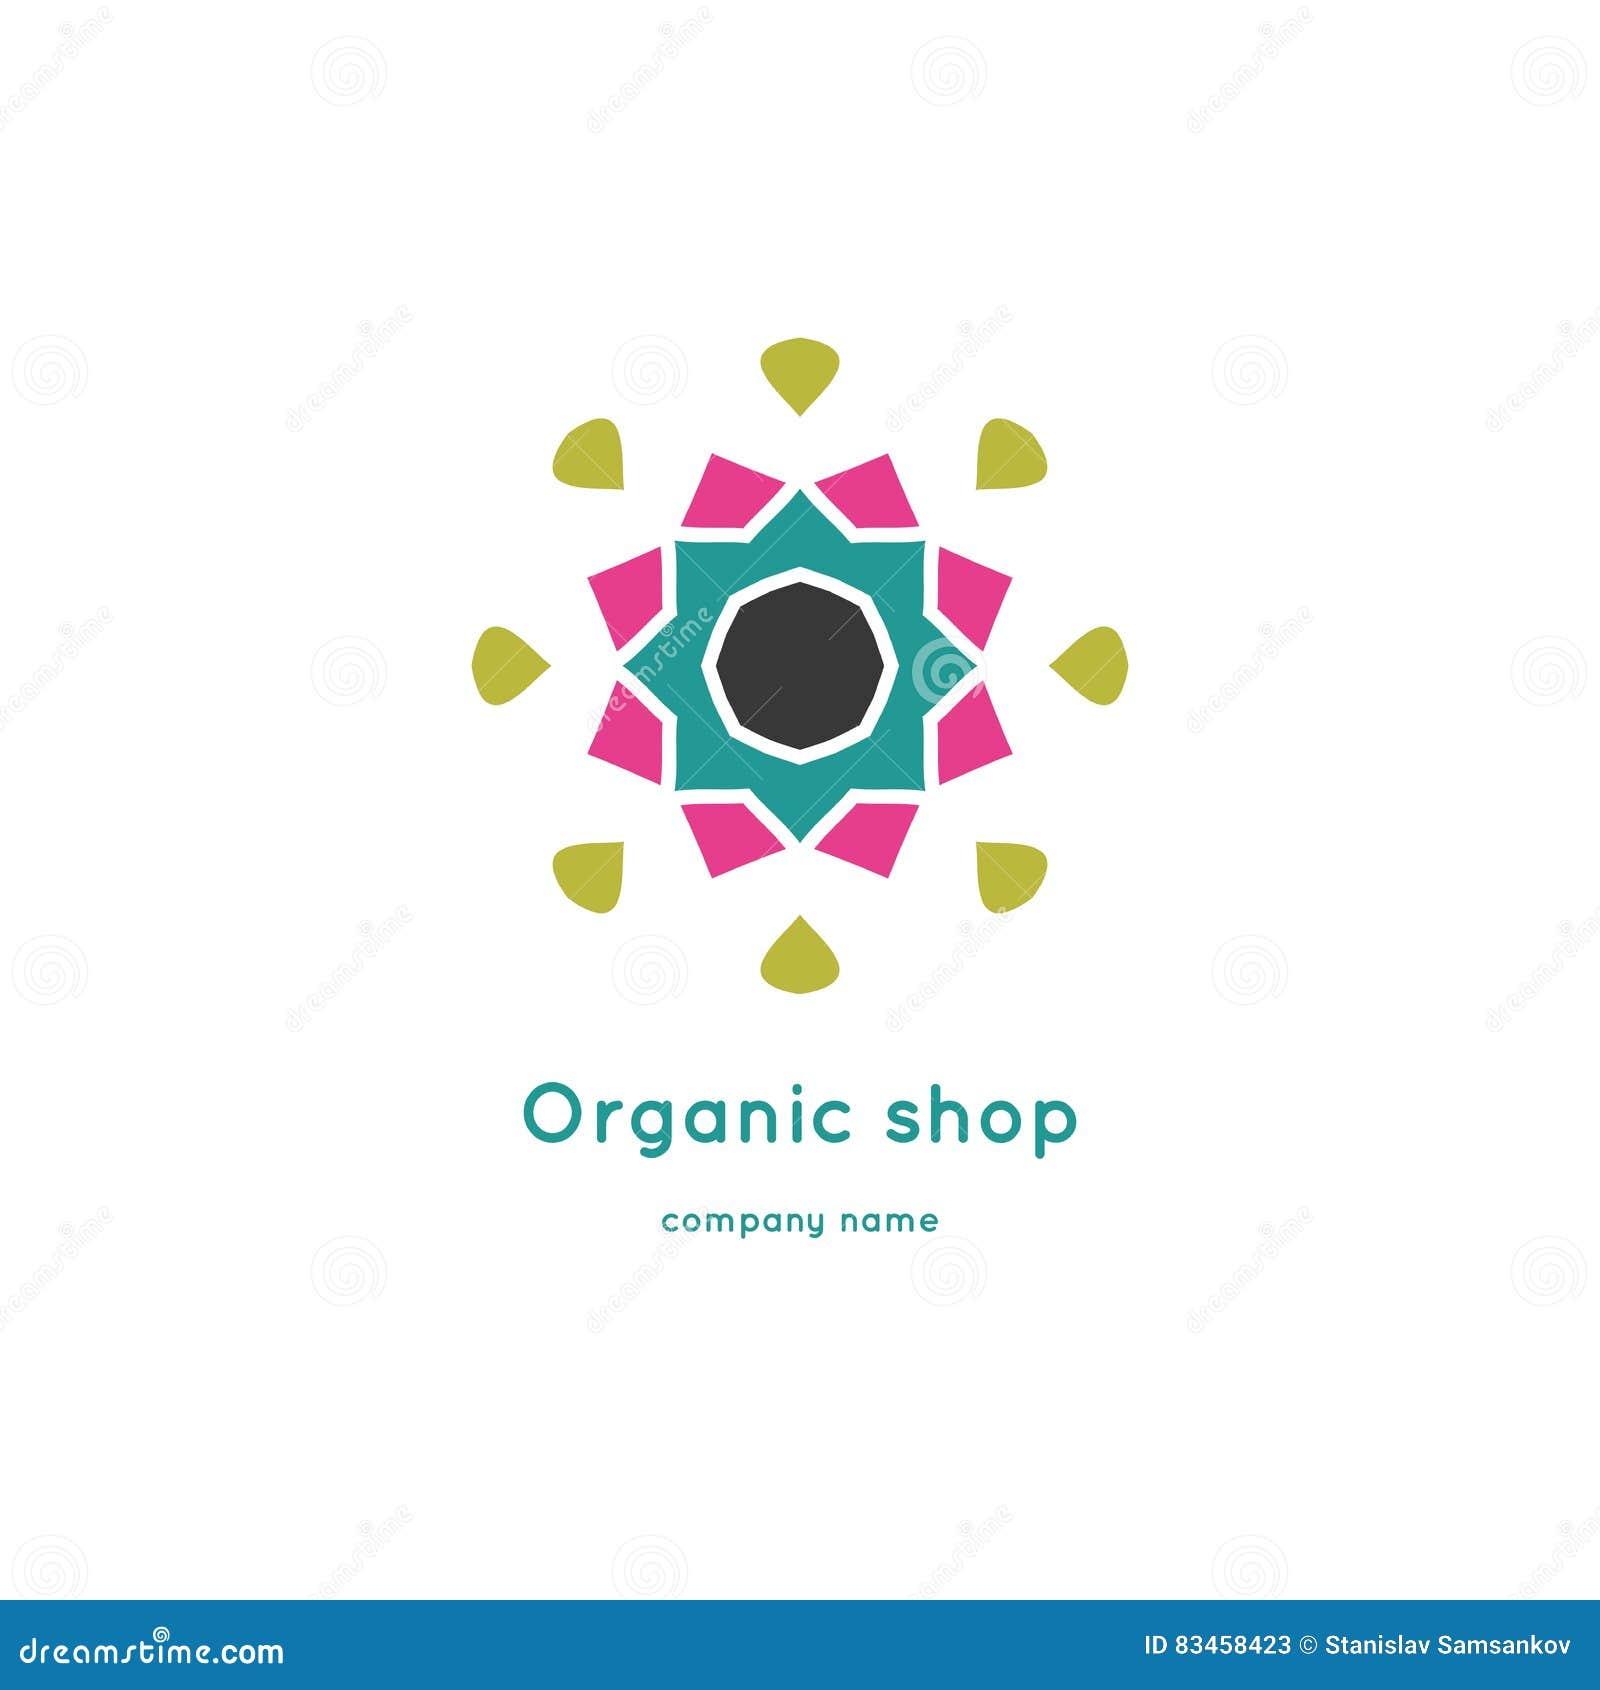 Bright And Juicy Beautiful Circular Logo For Organic Shop, Eco ...